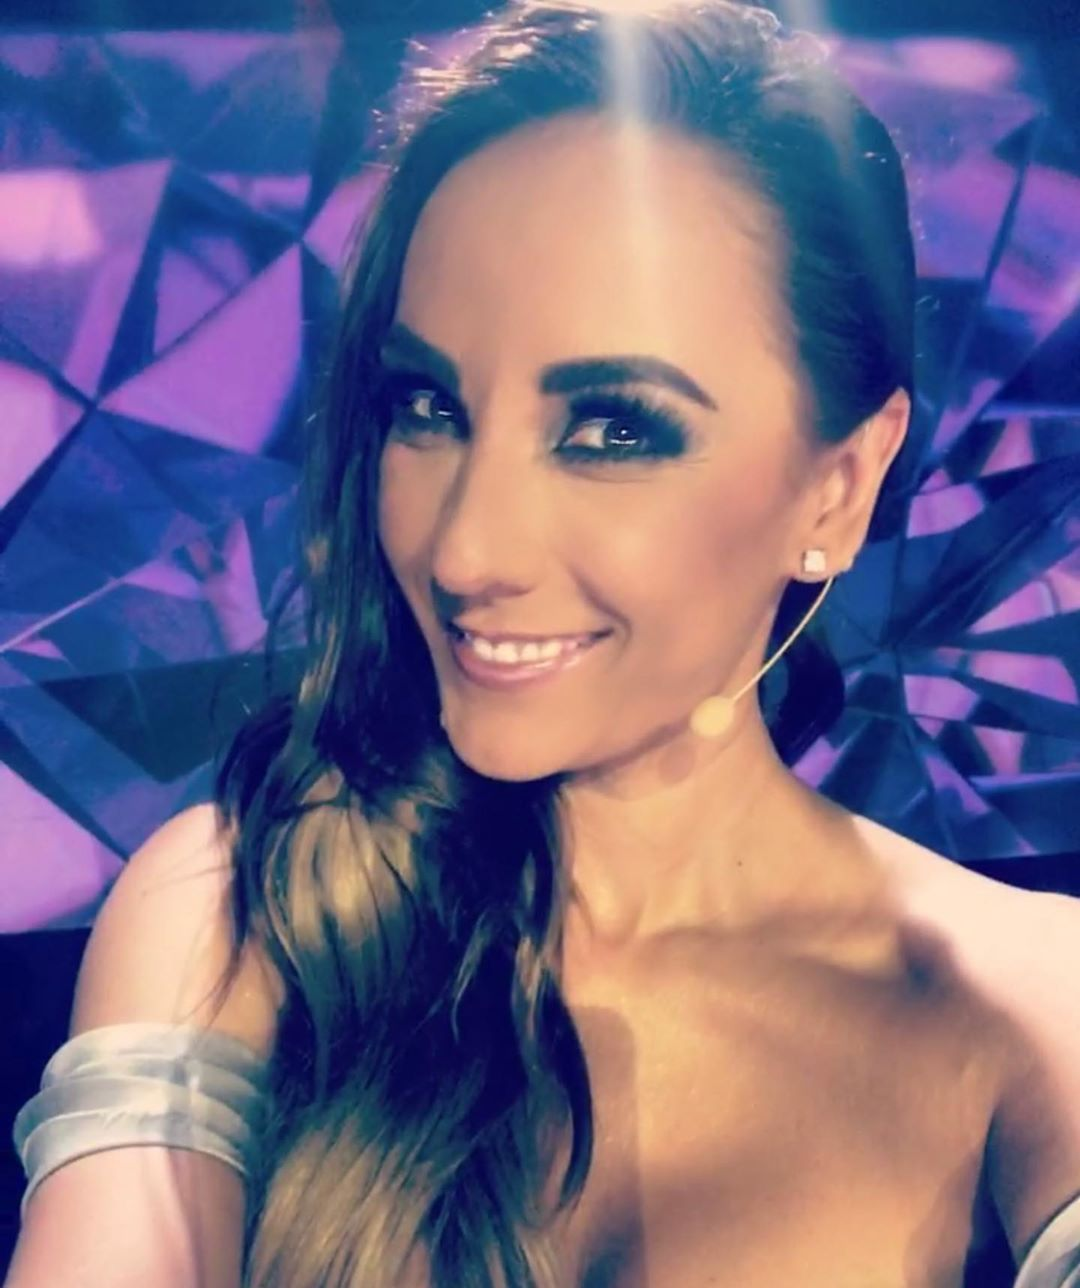 Consuelo Duval quiere matrimonio con Alejandro Fernandez